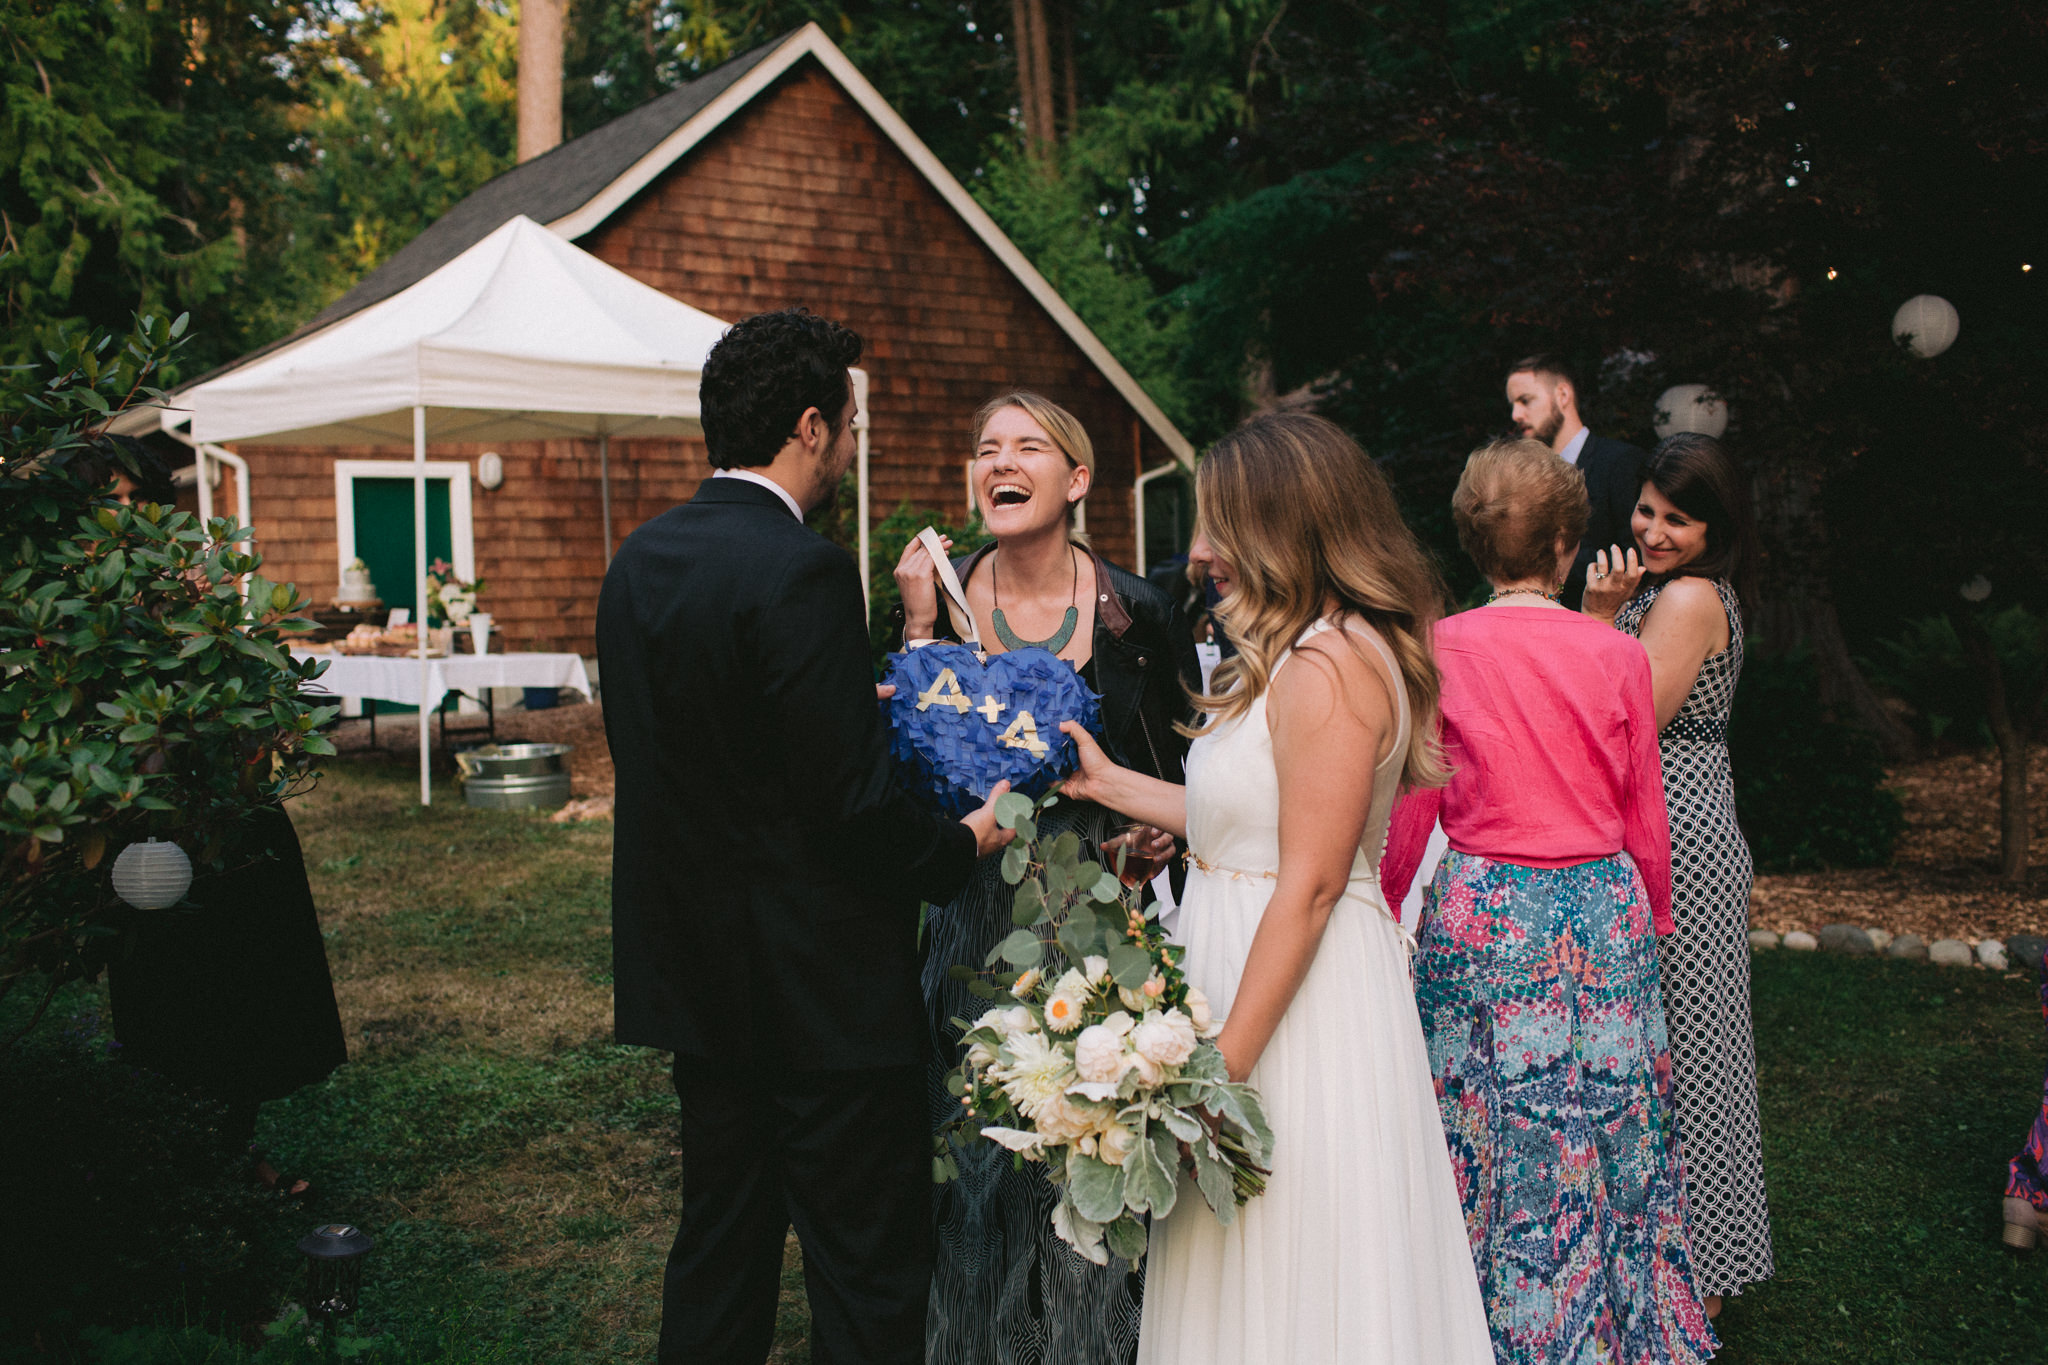 Backyard-Bainbridge-Island-Wedding-Alycia-Lovell-Photography-174.JPG